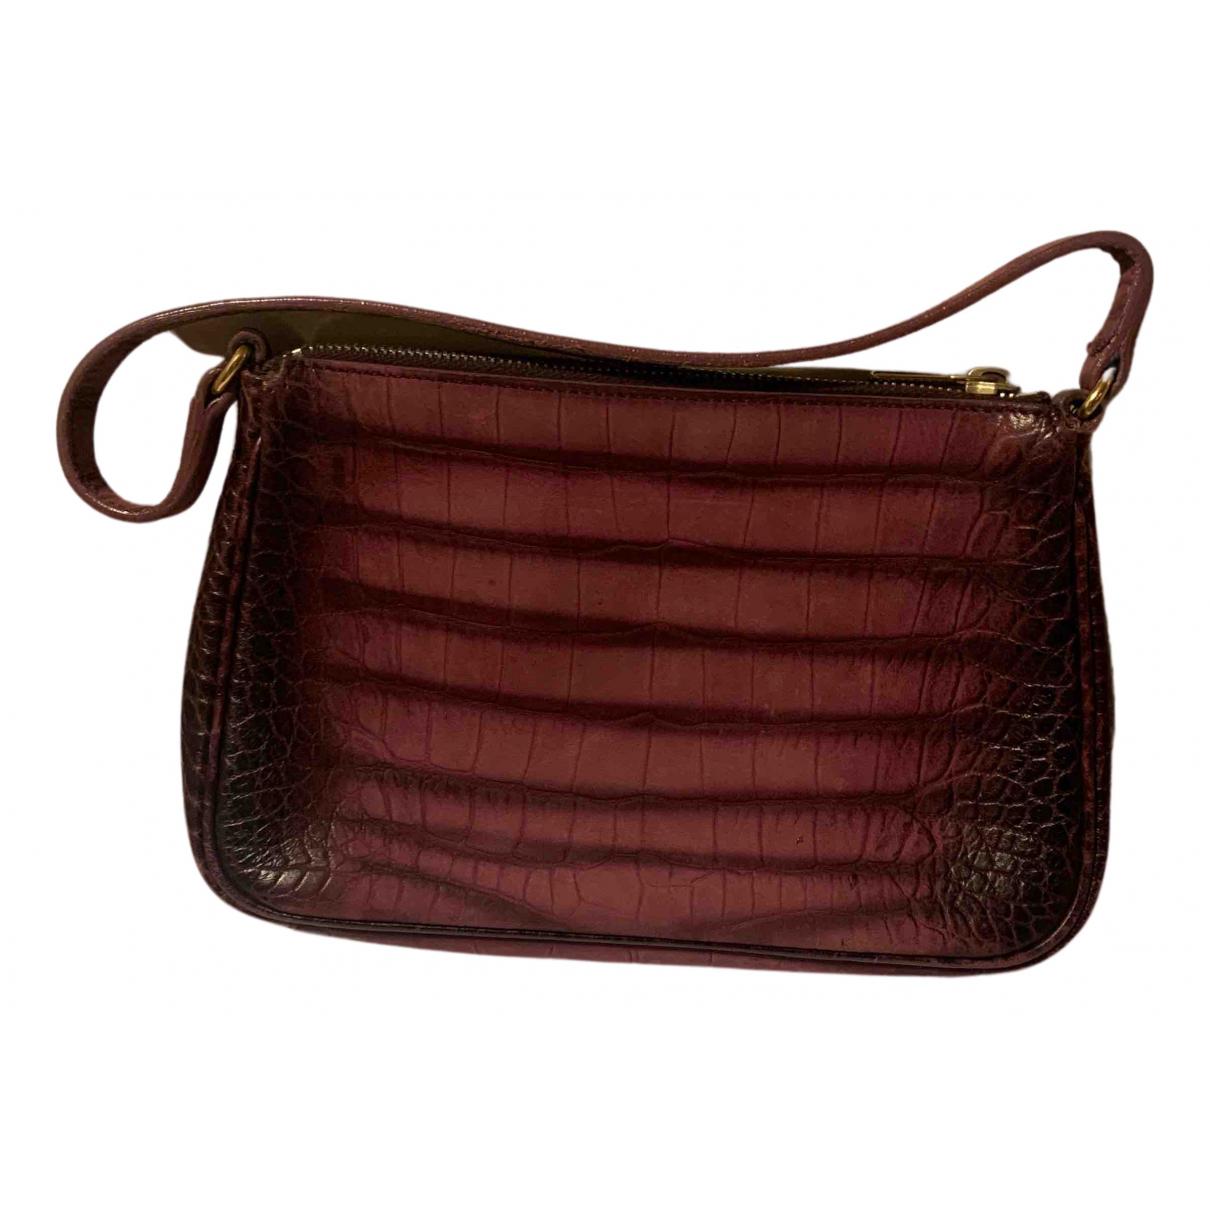 Yves Saint Laurent N Burgundy Leather Clutch bag for Women N